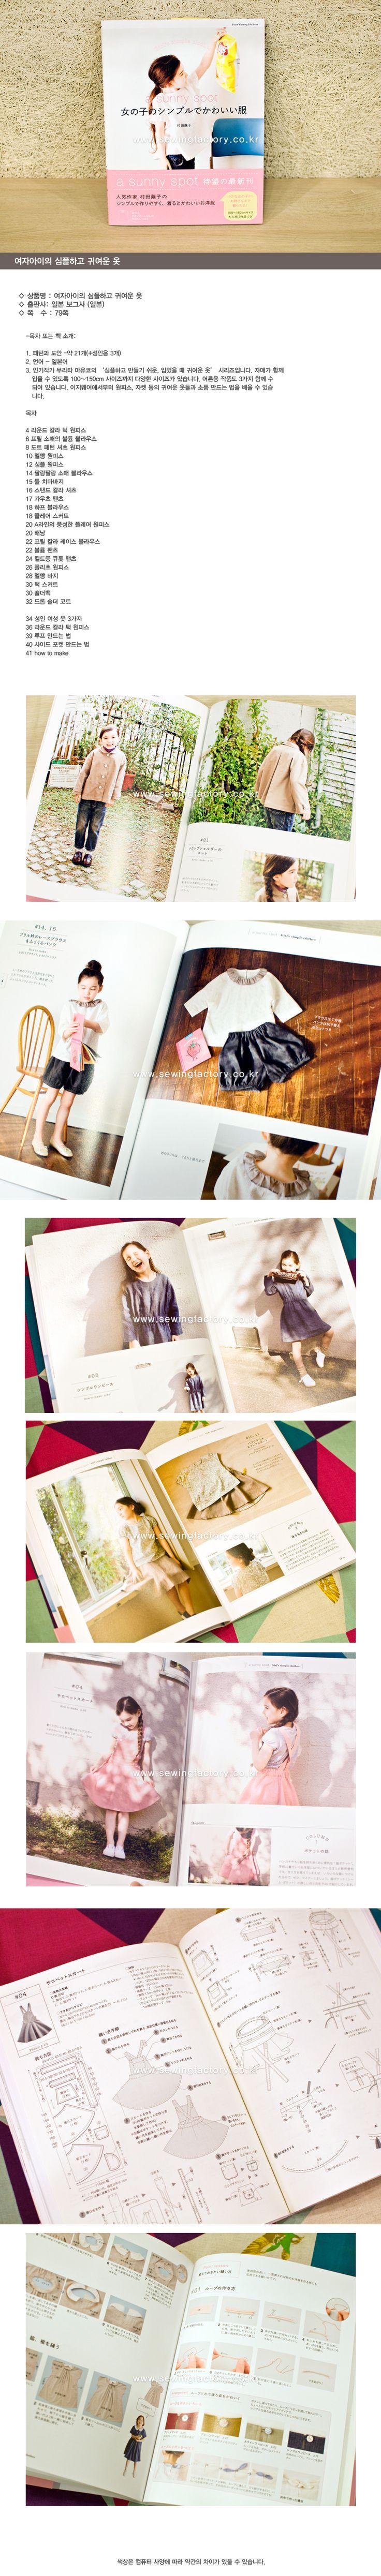 BCCMALL 부라더 공식 온라인 종합쇼핑몰 [A sunny spot 여자아이의 심플하고 귀여운 옷]